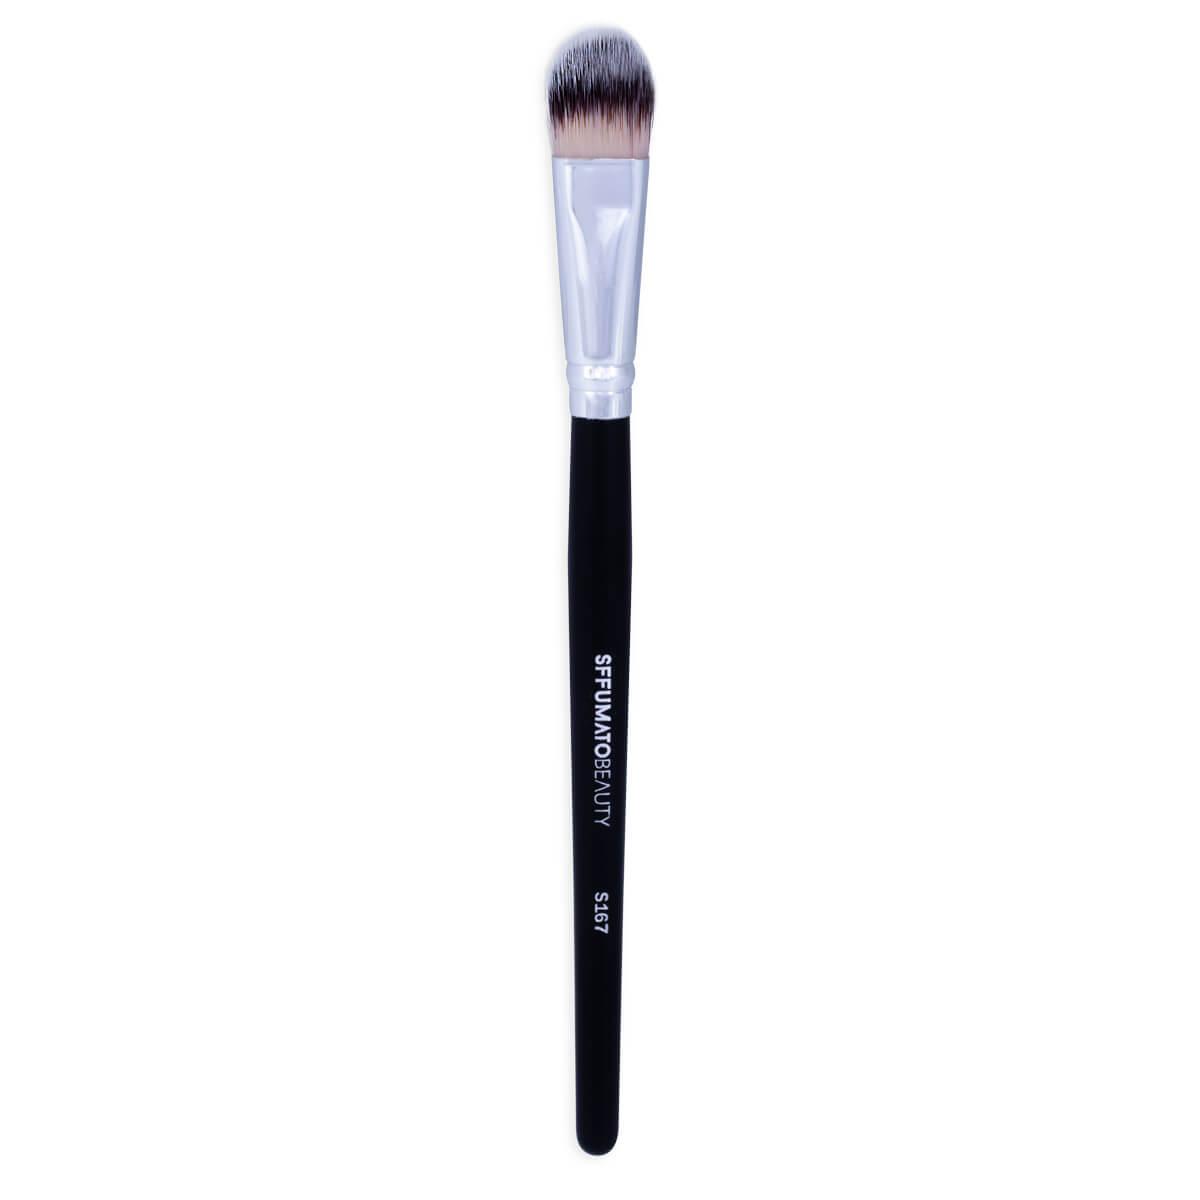 S167 - Pincel Para Base Língua De Gato Médio Profissional Sffumato Beauty